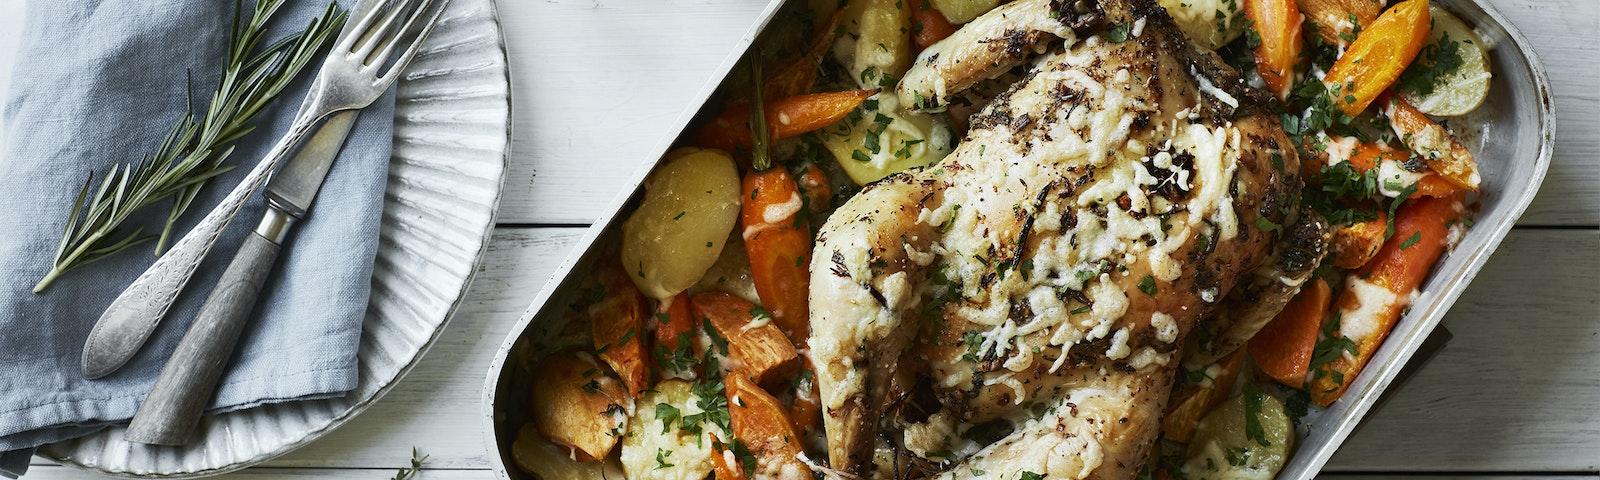 Hel kylling med kartofler, gulerødder, ost og urter